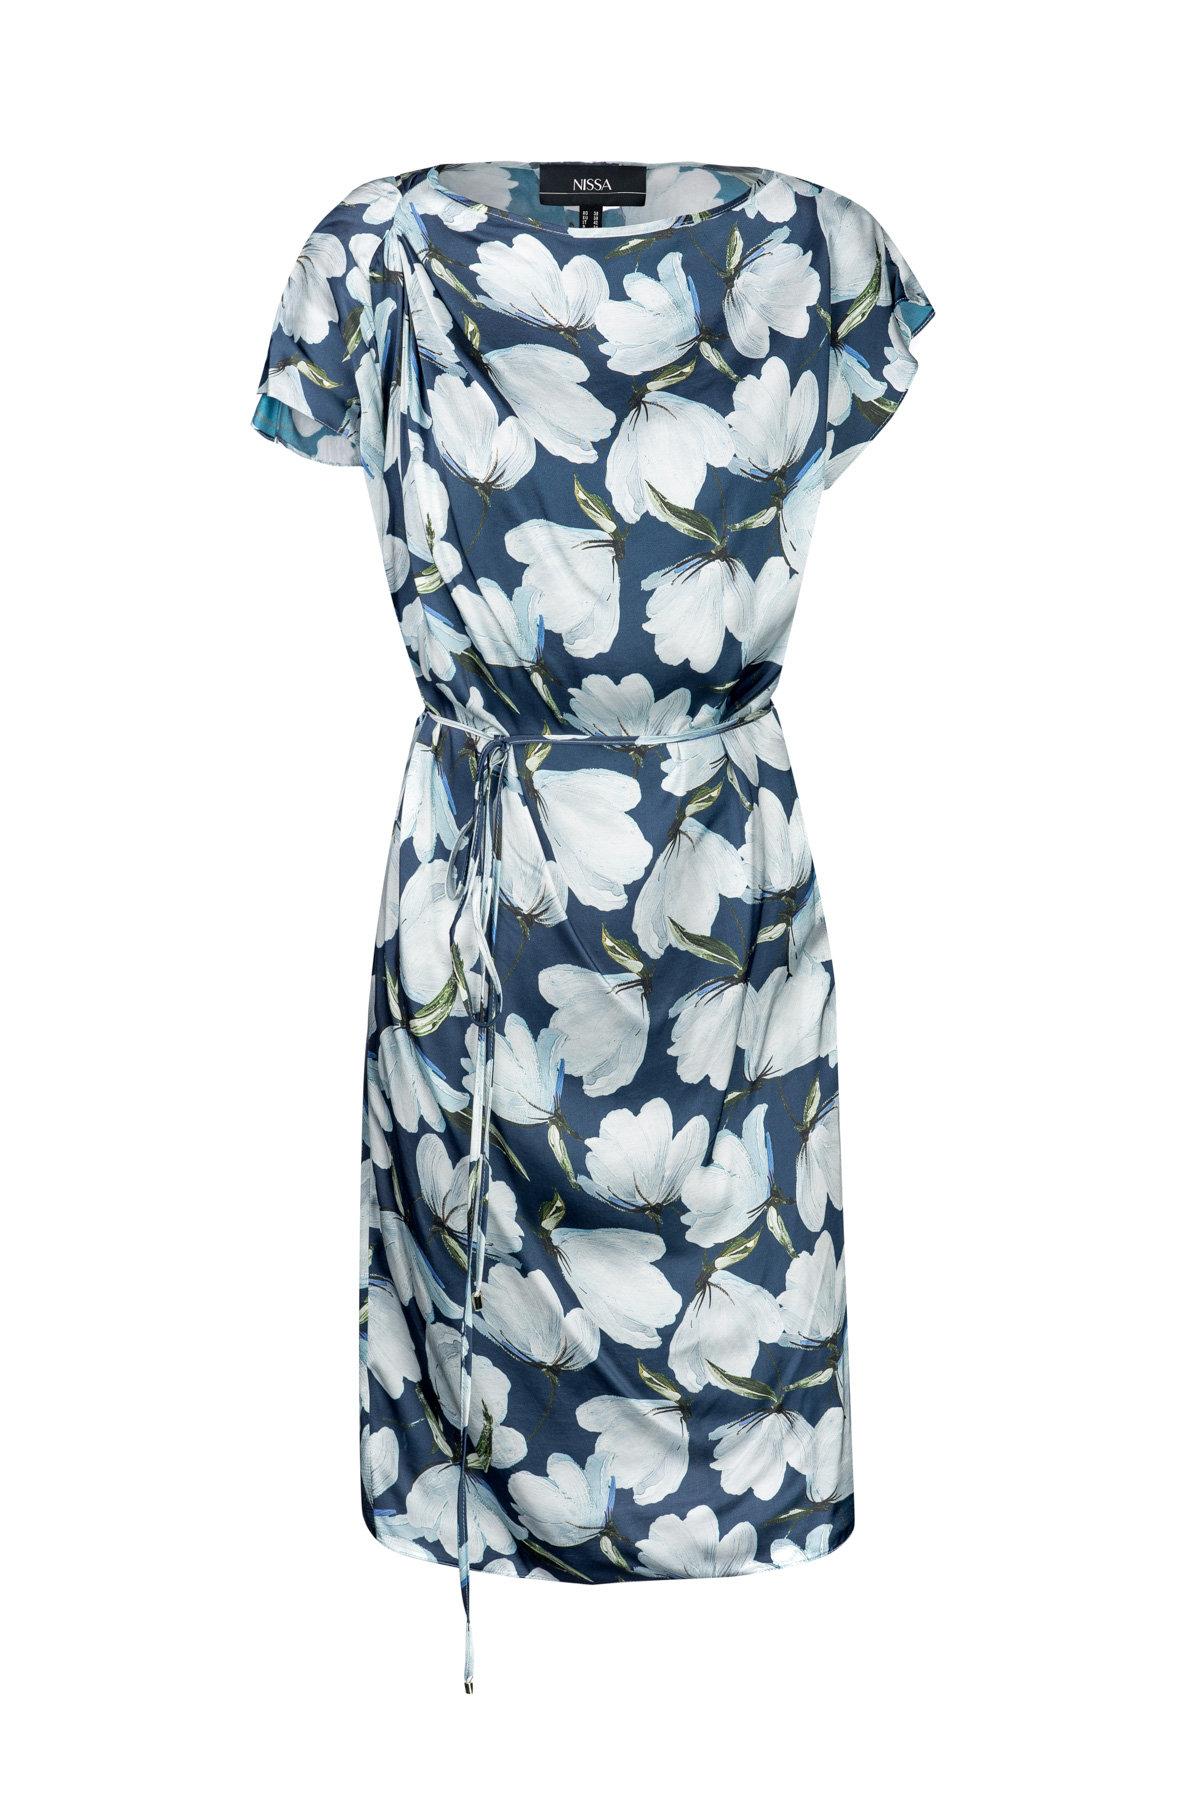 Rochie De Zi Cu Imprimeu Floral Imprimeu Albastru